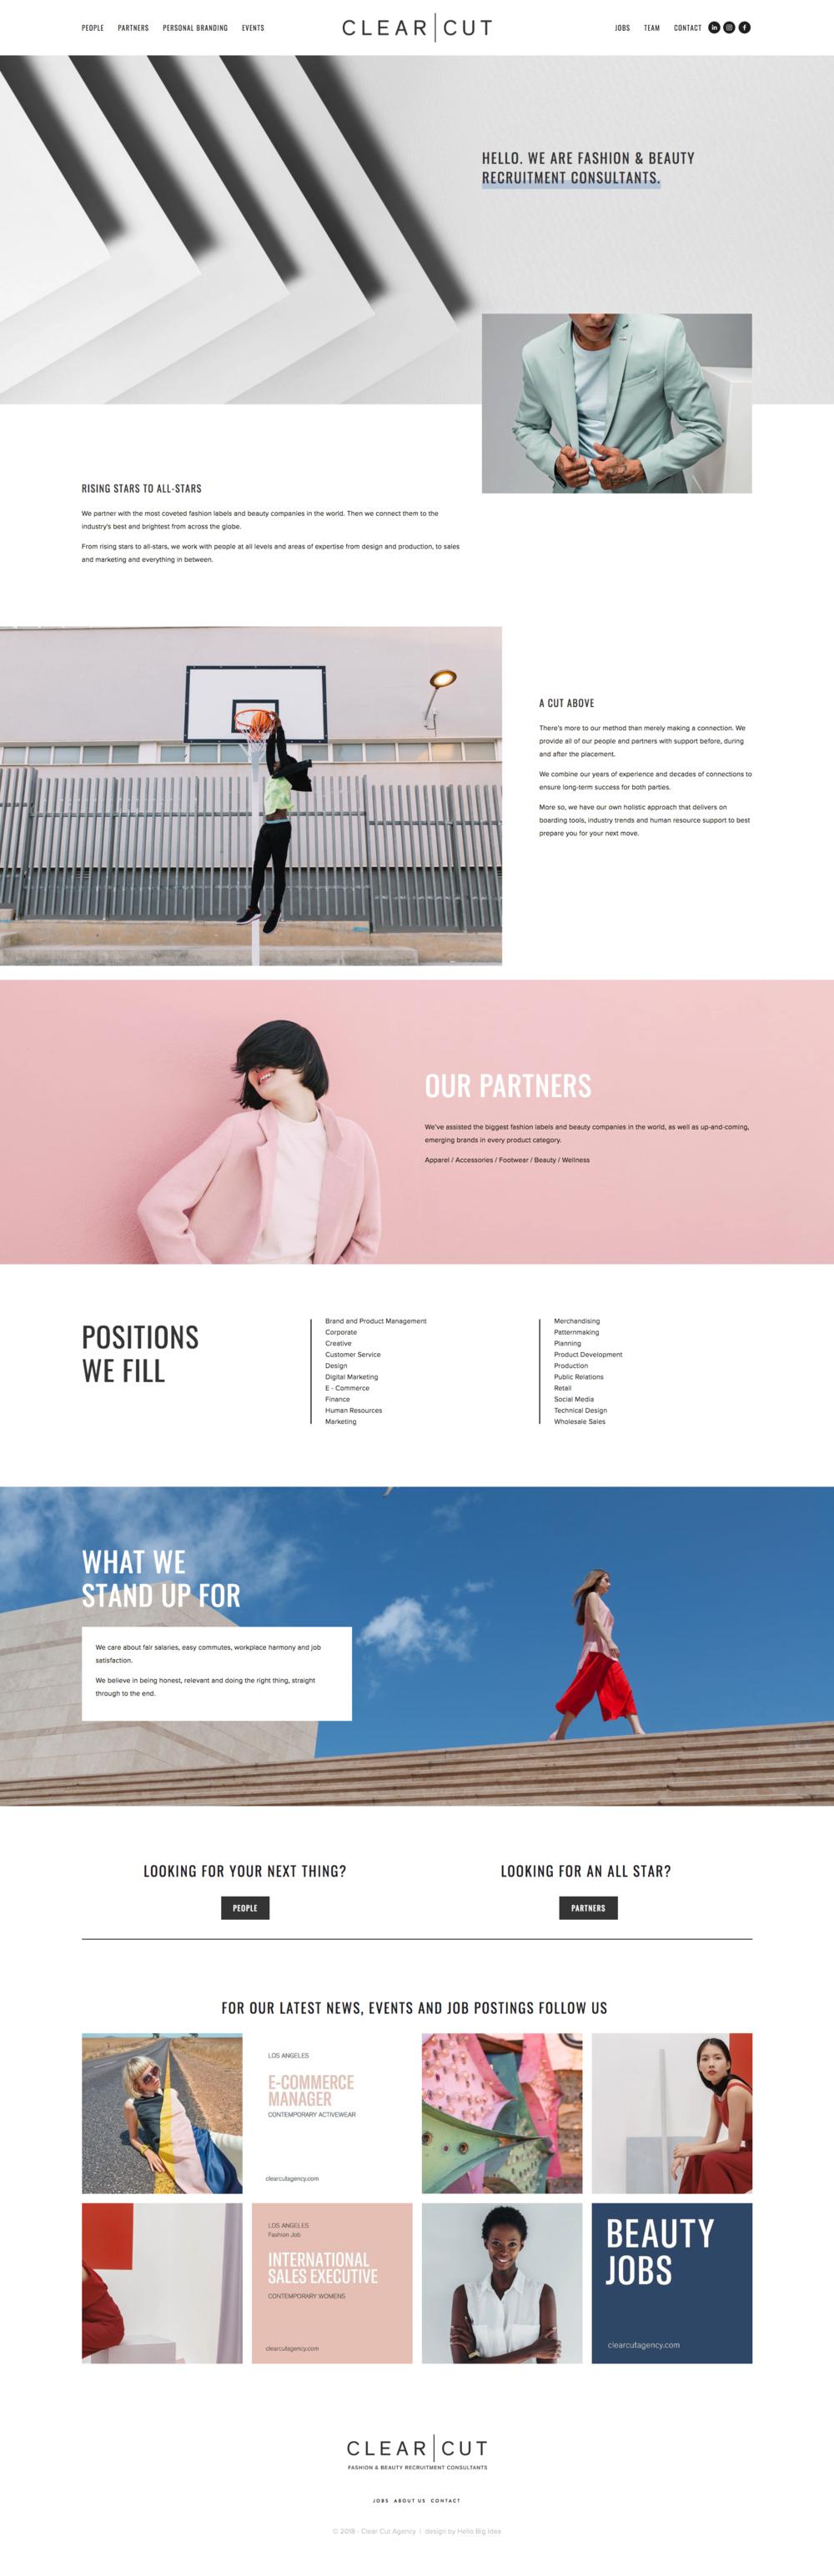 Clear-Cut-Agency-Web-Design.png